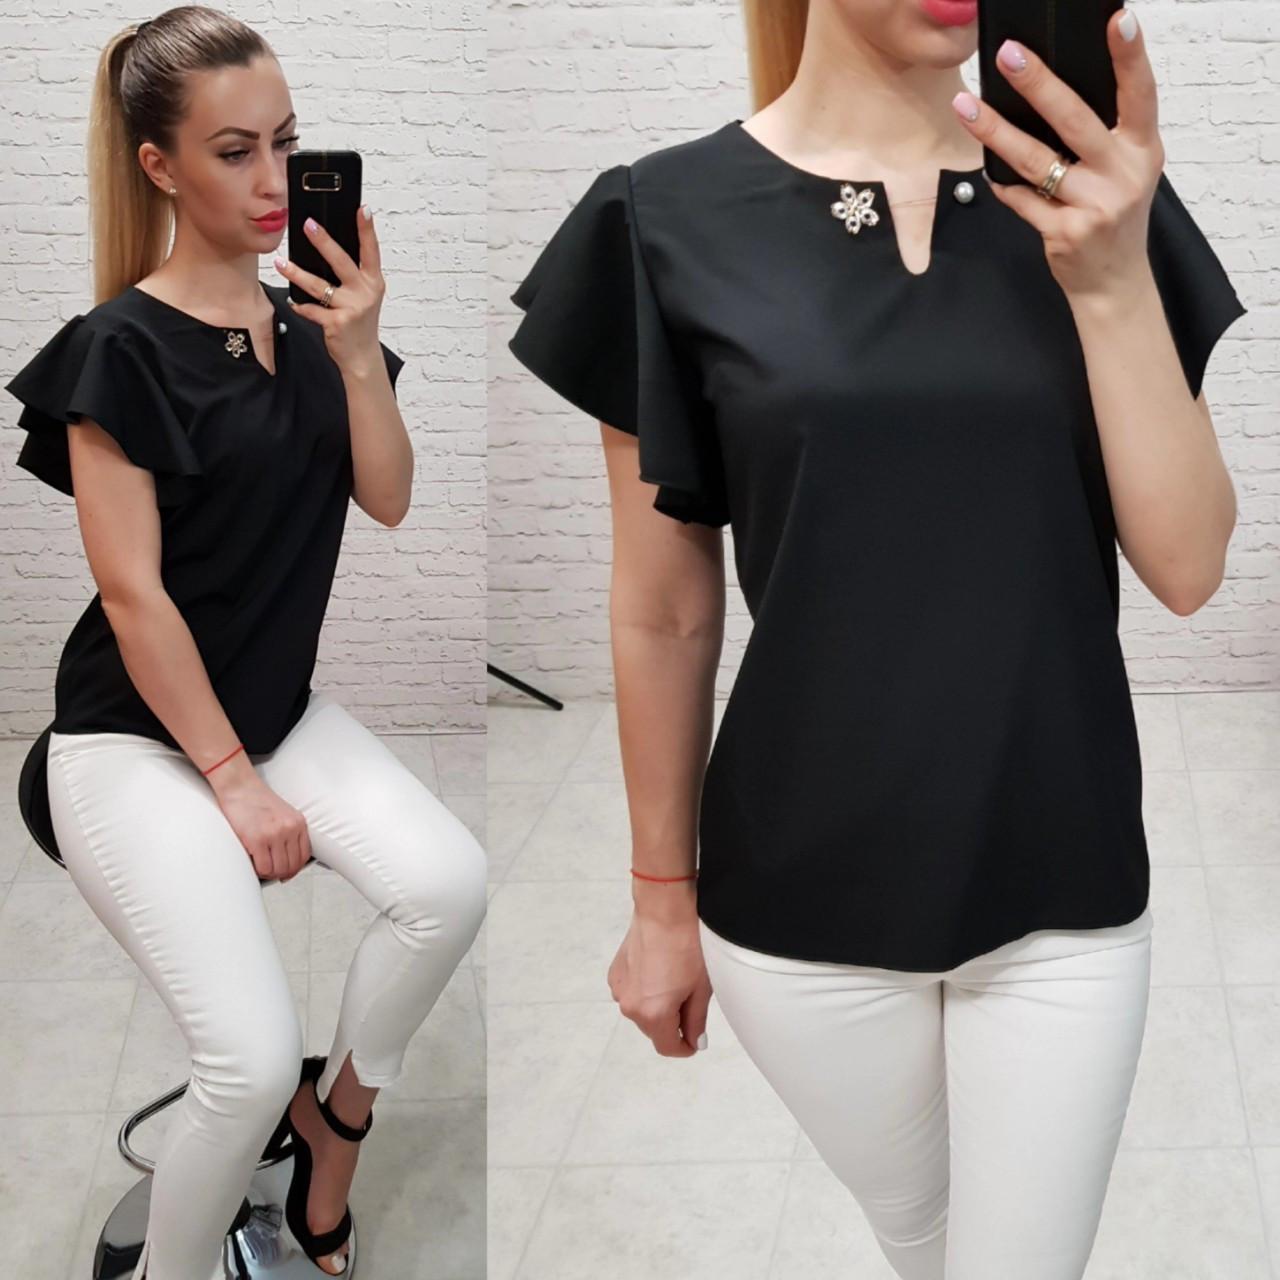 Блузка / блуза  с брошкой без рукава арт. 166 черный / черная